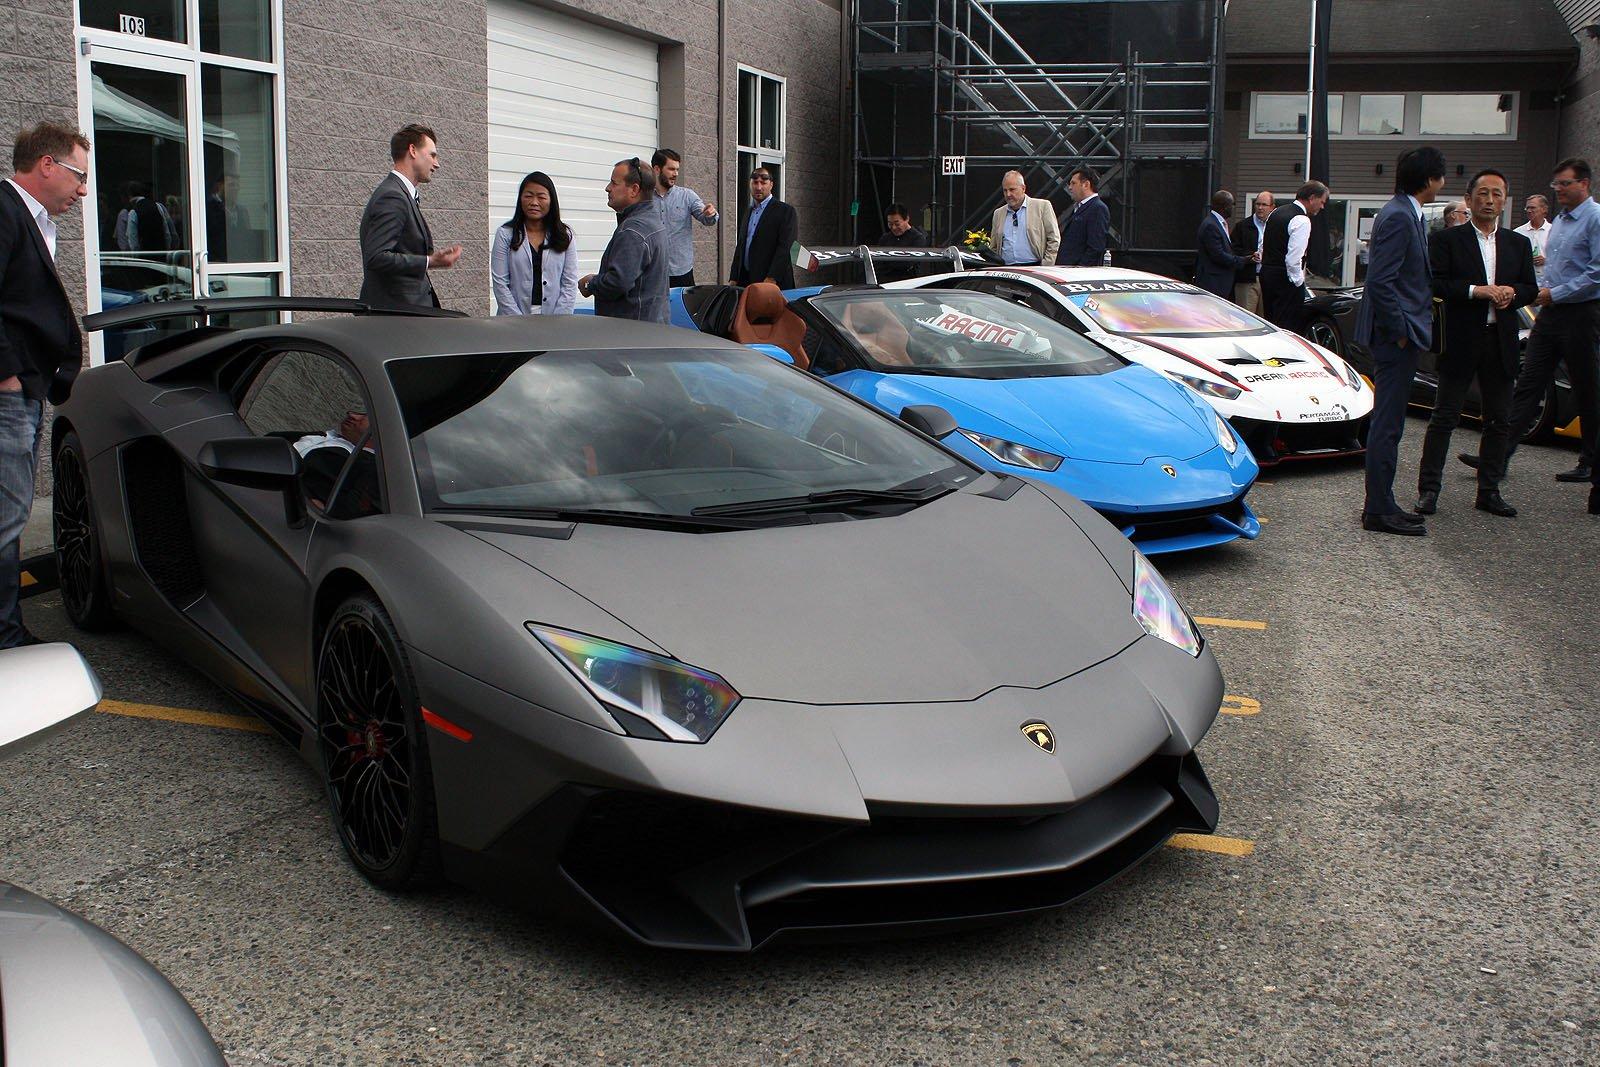 Lamborghini-ACSL-Grand-Opening-17